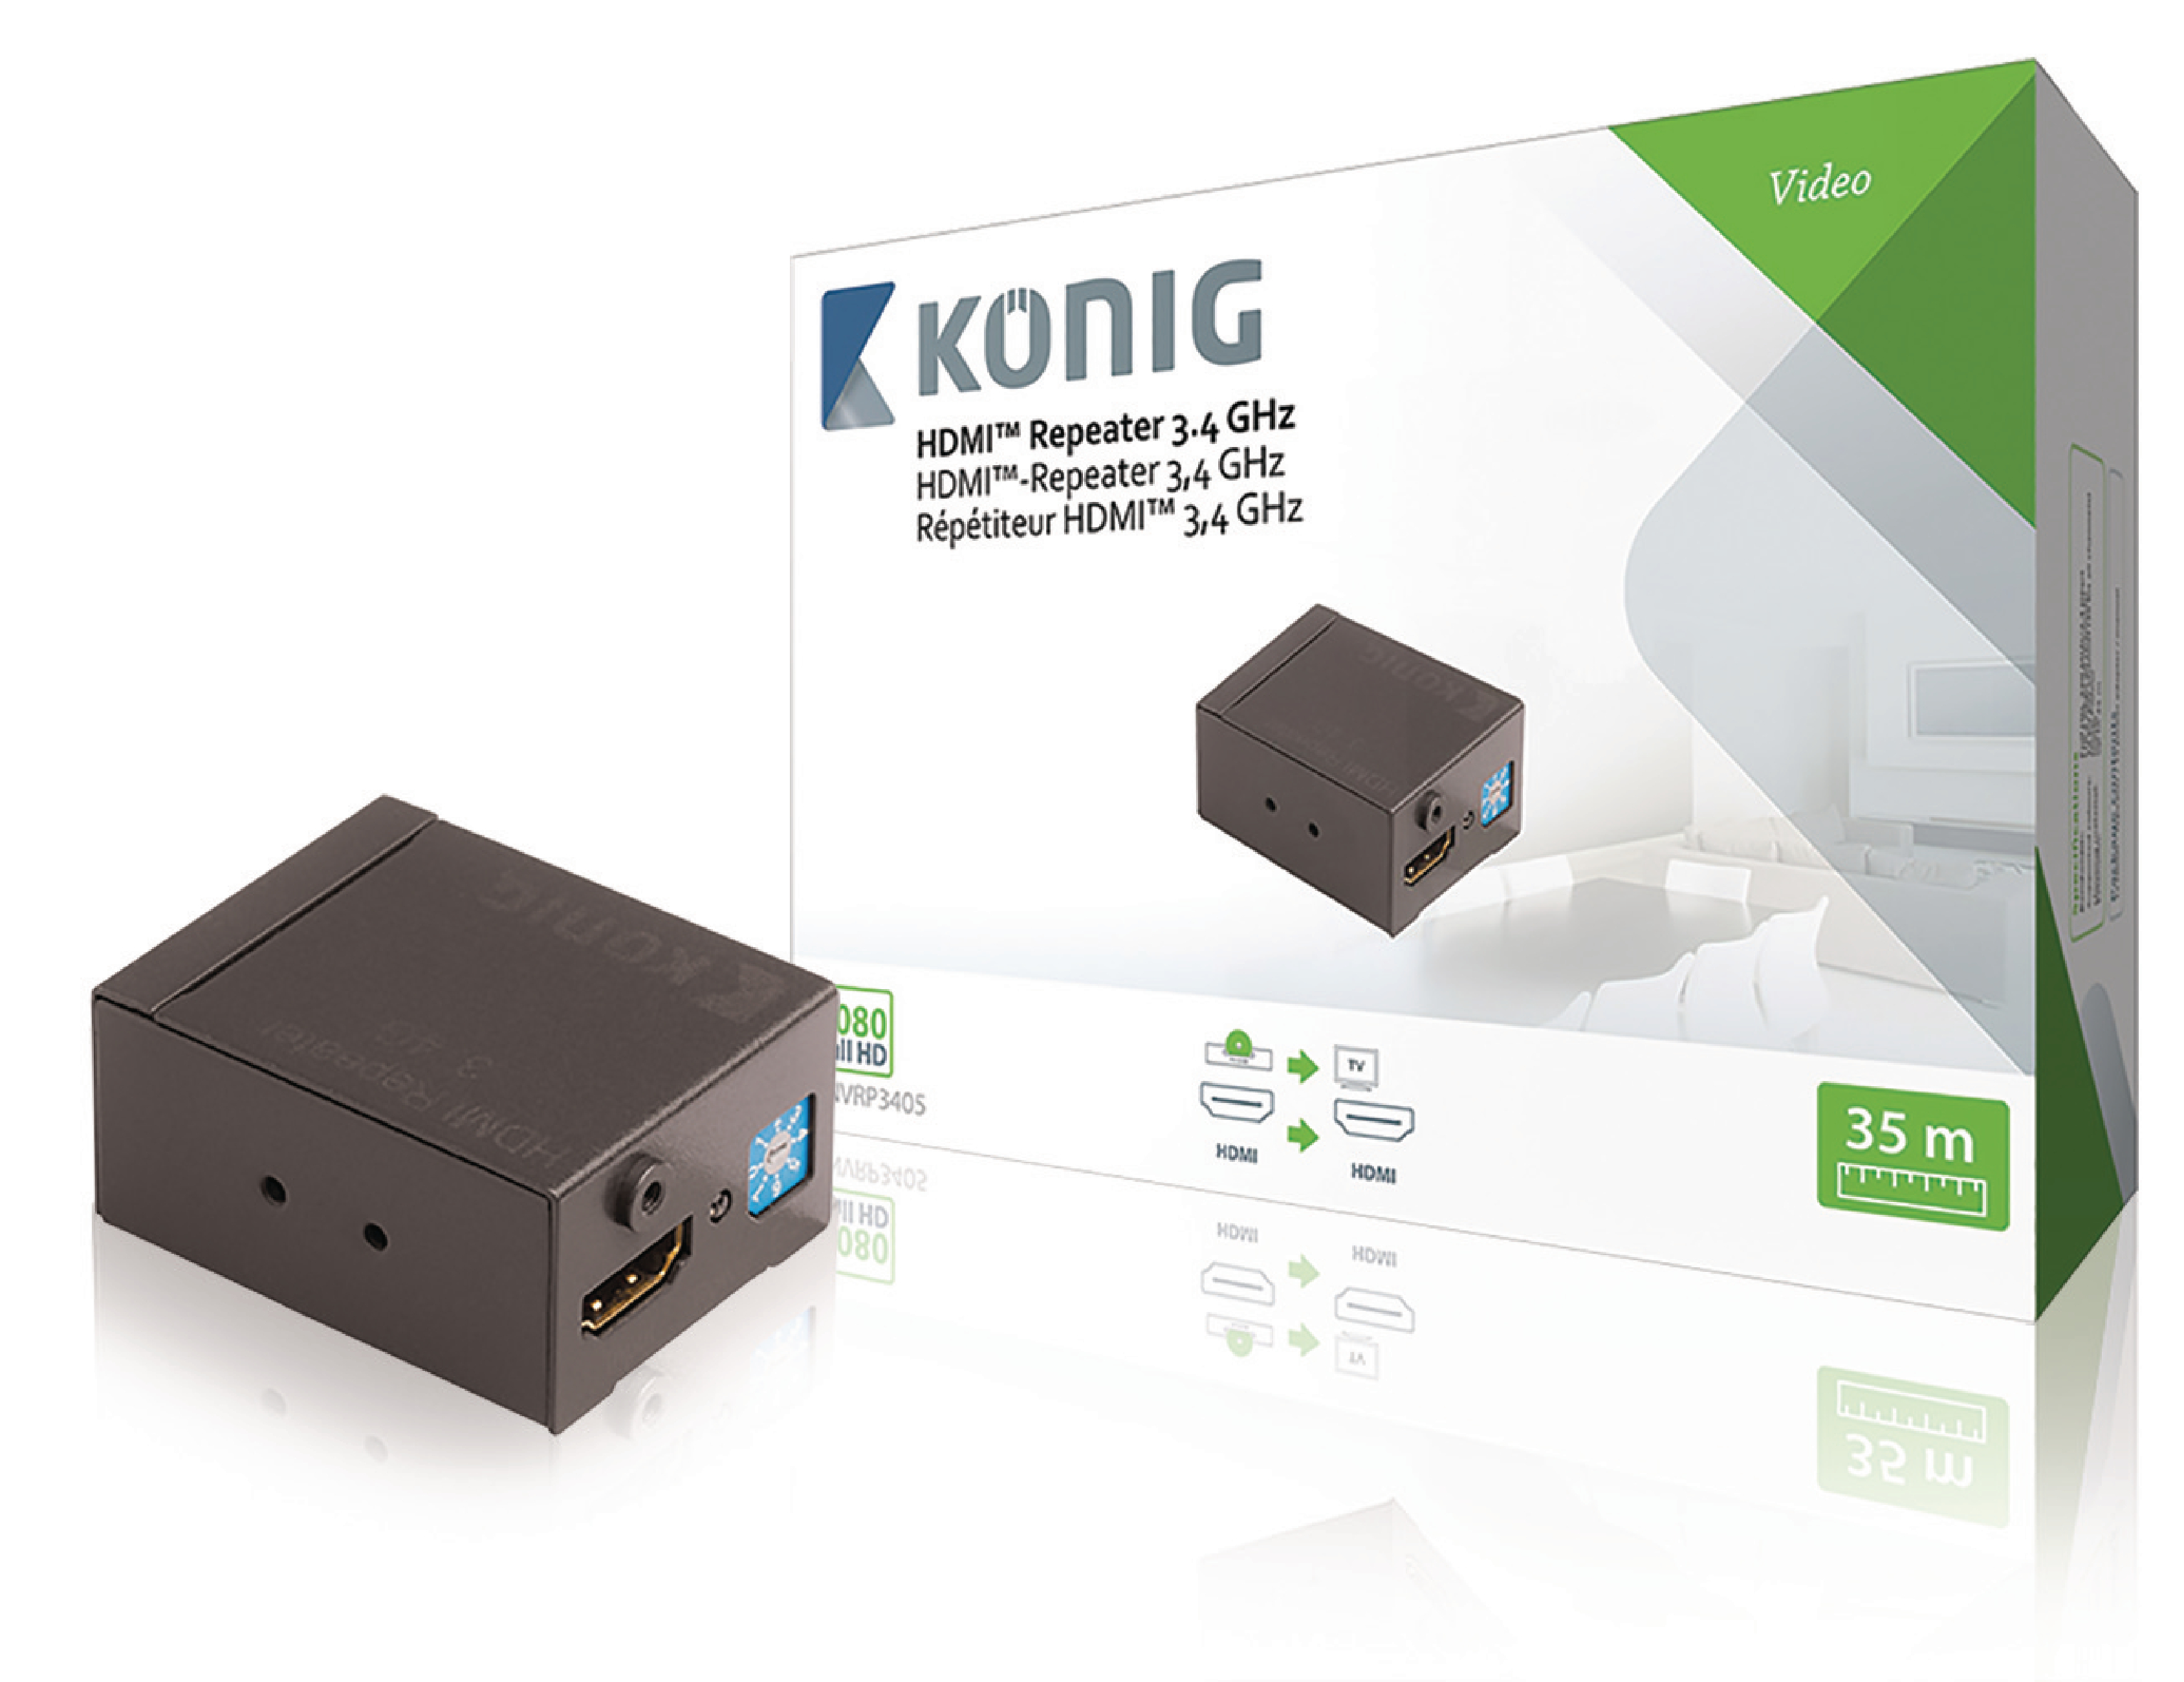 Zesilovač HDMI, Full HD 1920x1080, do 35m König KNVRP3405